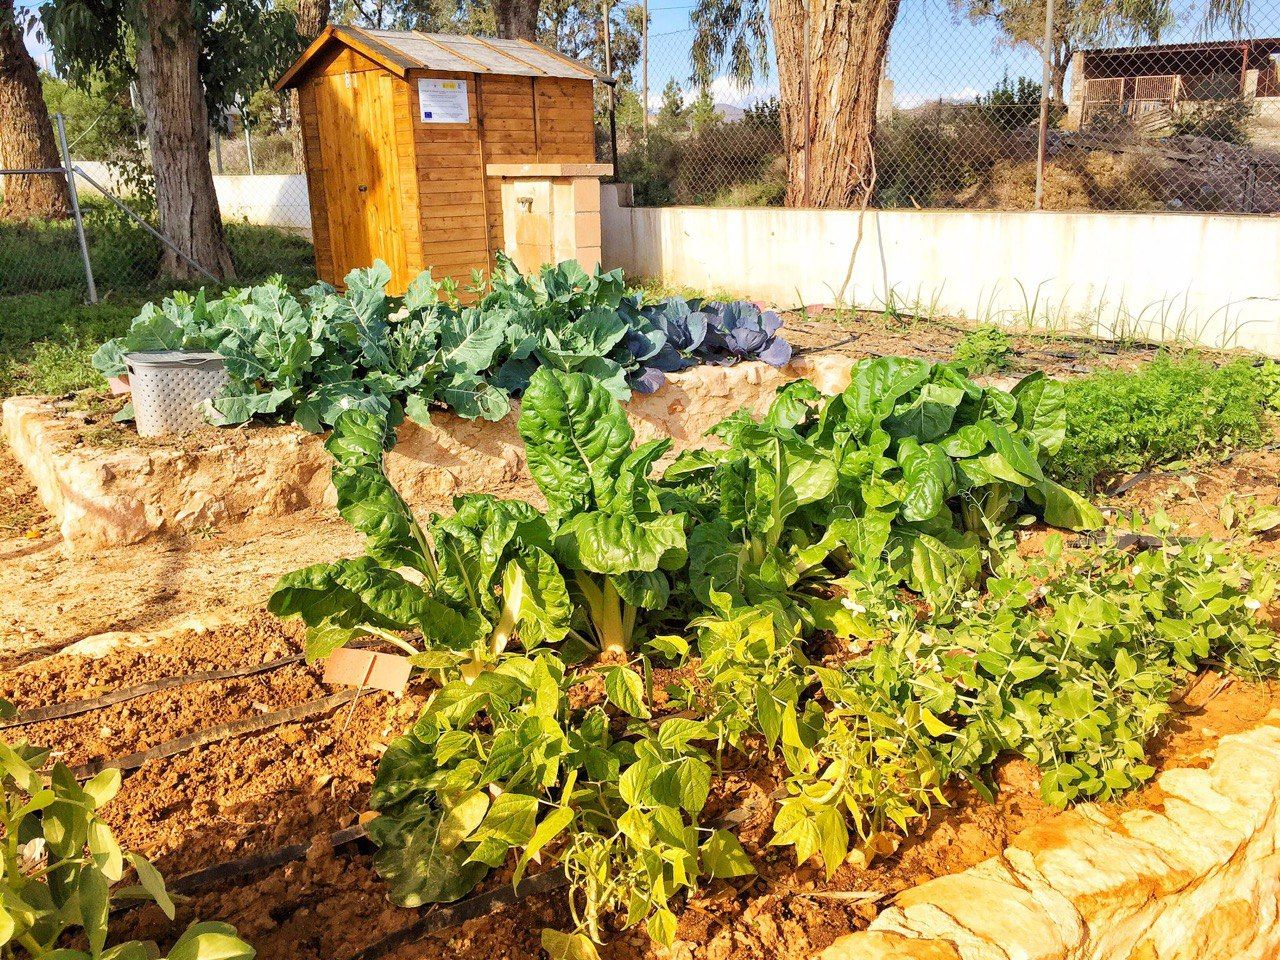 photo5384203734667603707 - Red Rural de Huertos Escolares